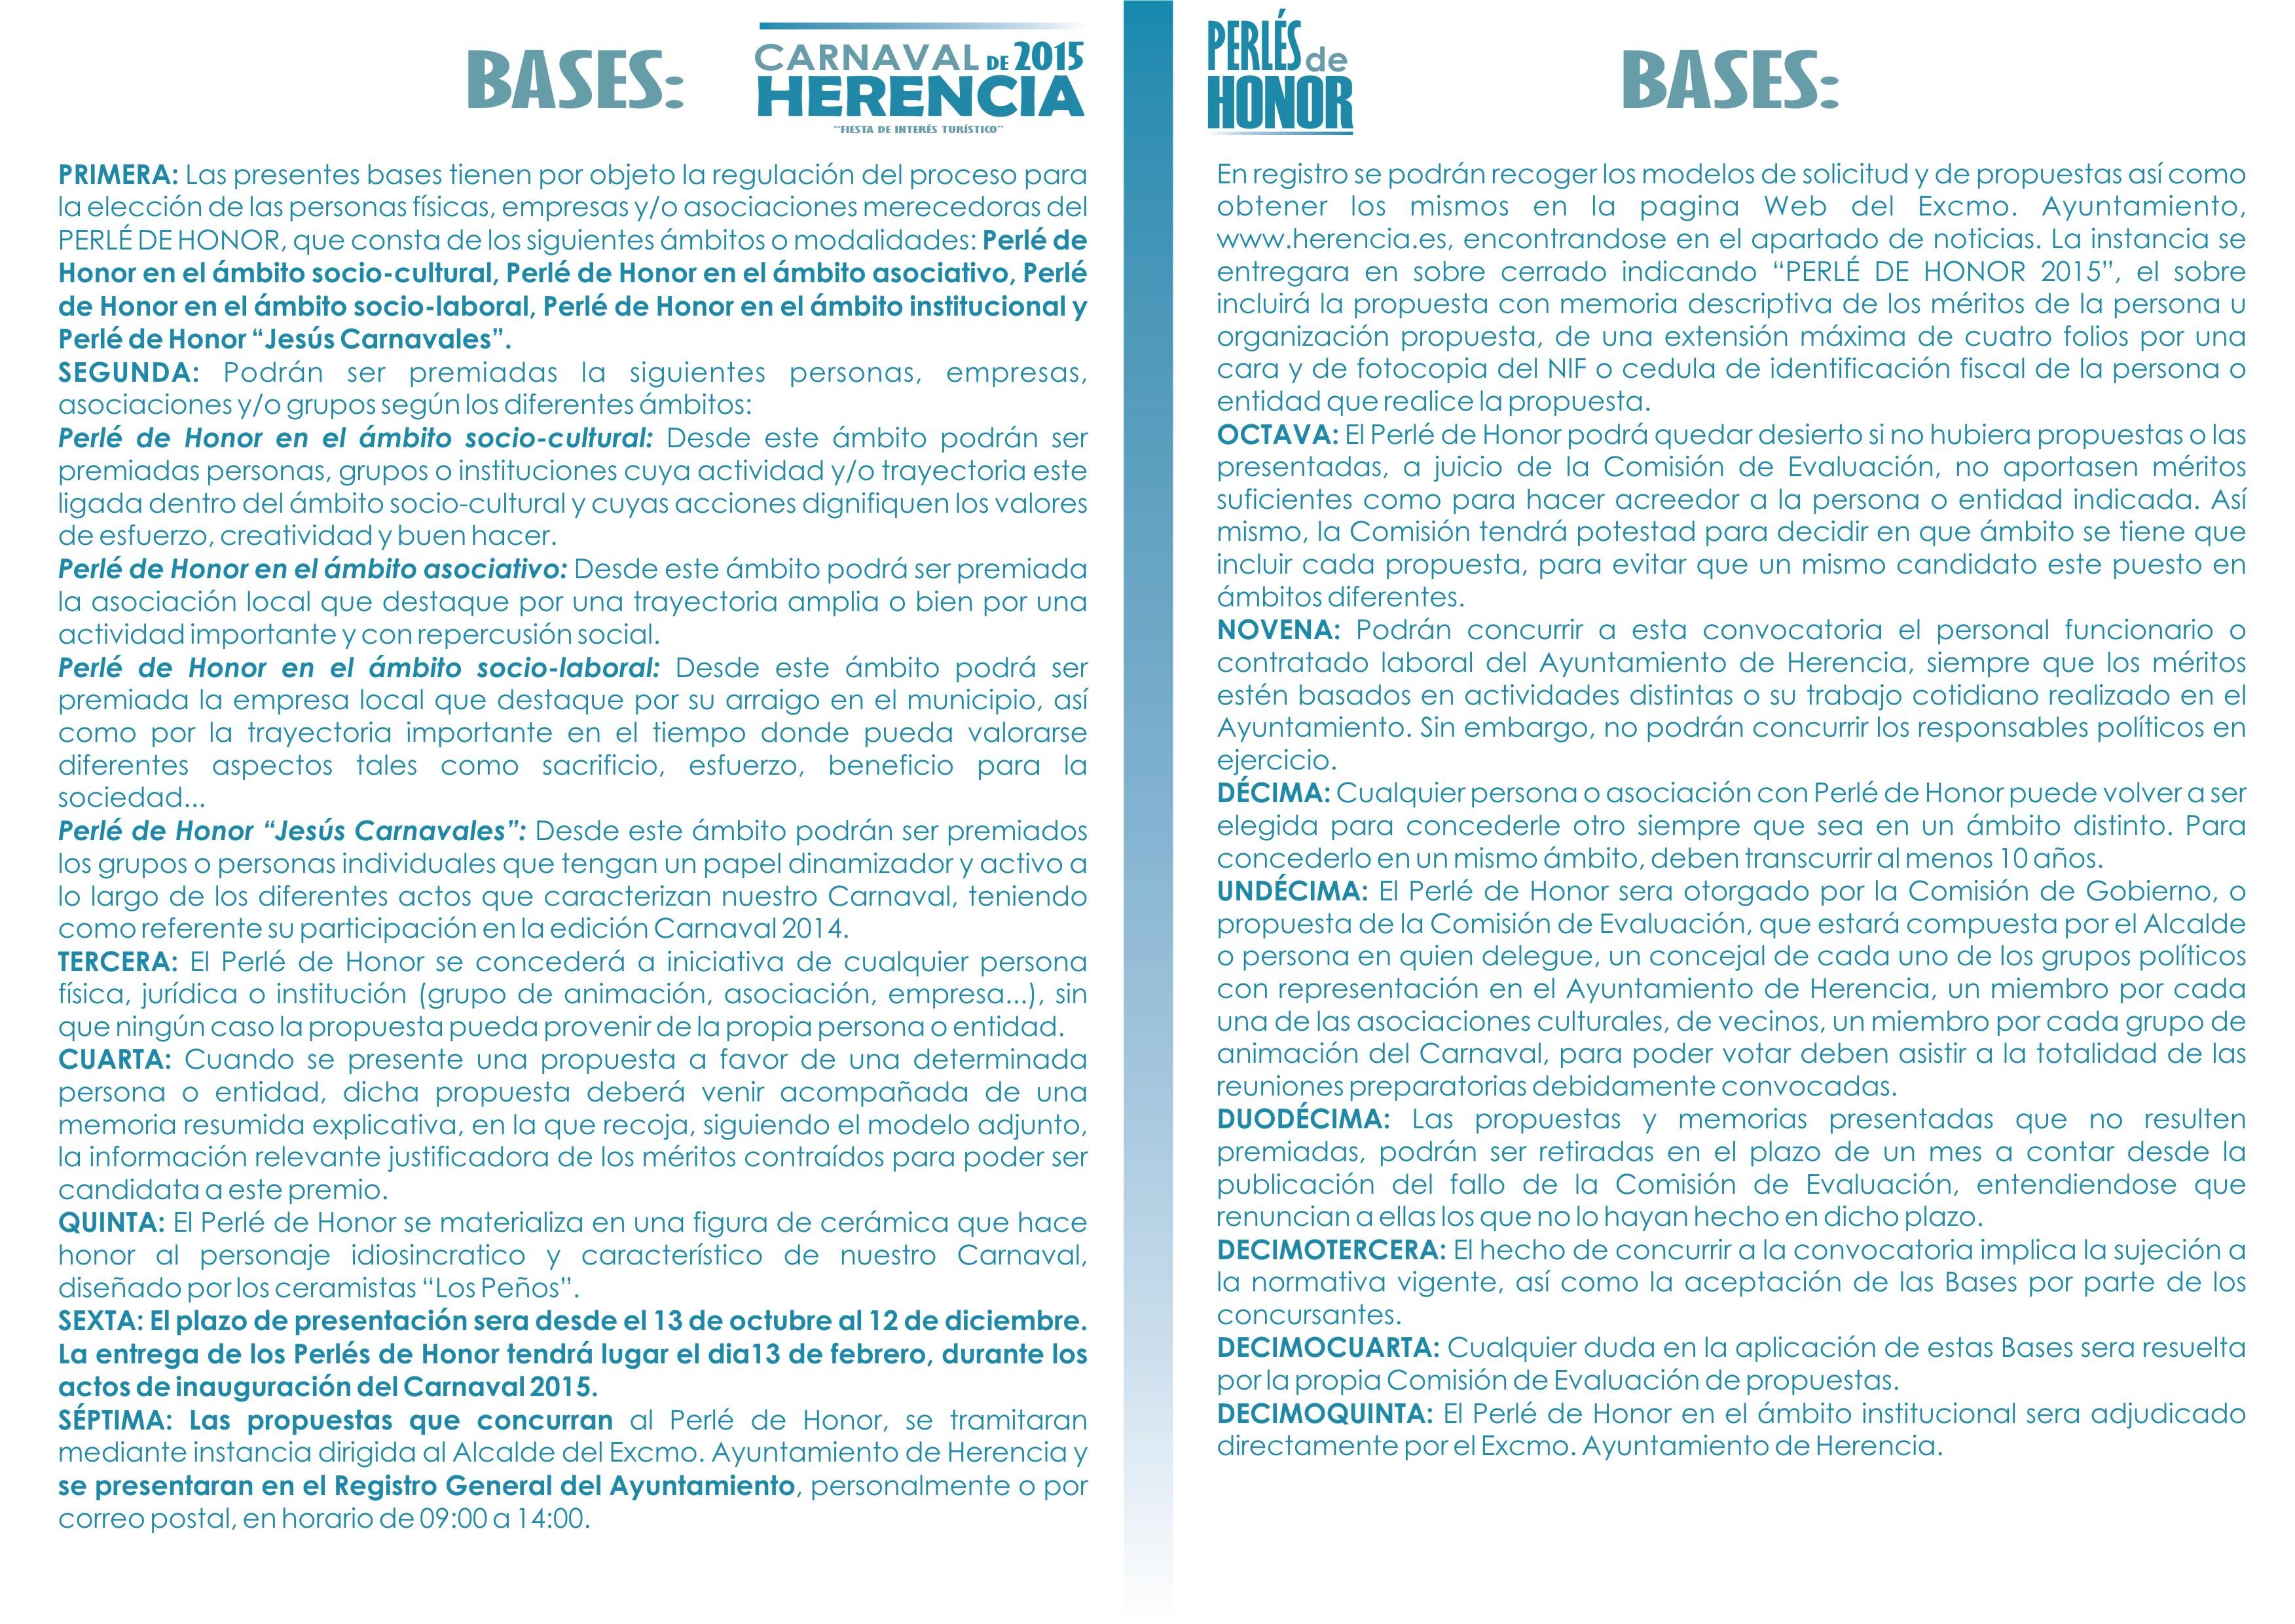 bases-perles-de-honor-carnaval-de-herencia-2015